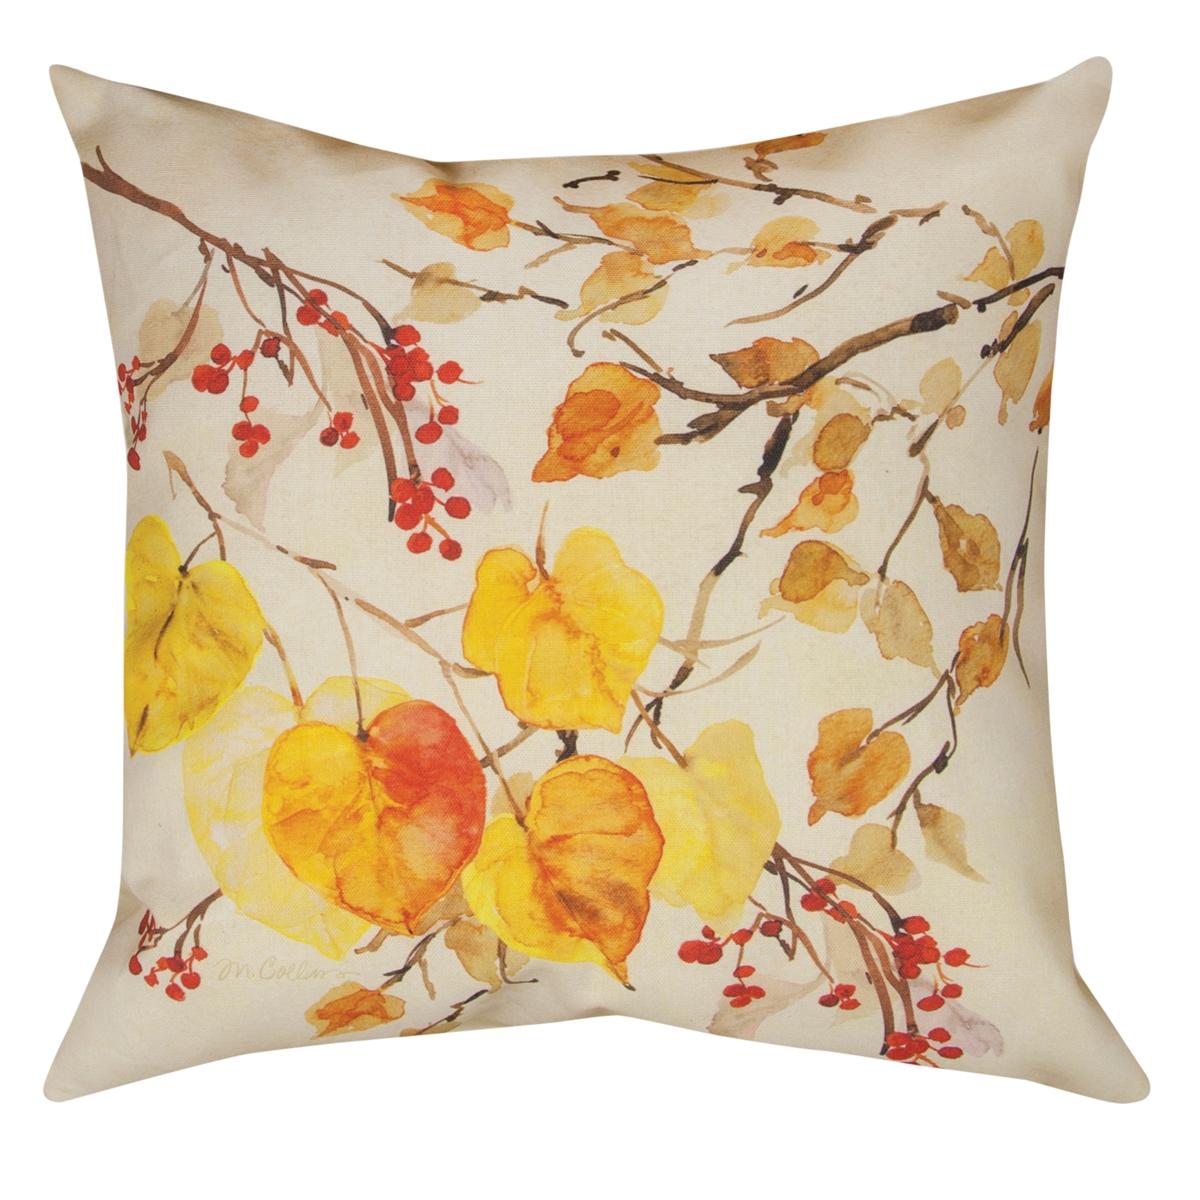 Golden Glory Foliage Pillow